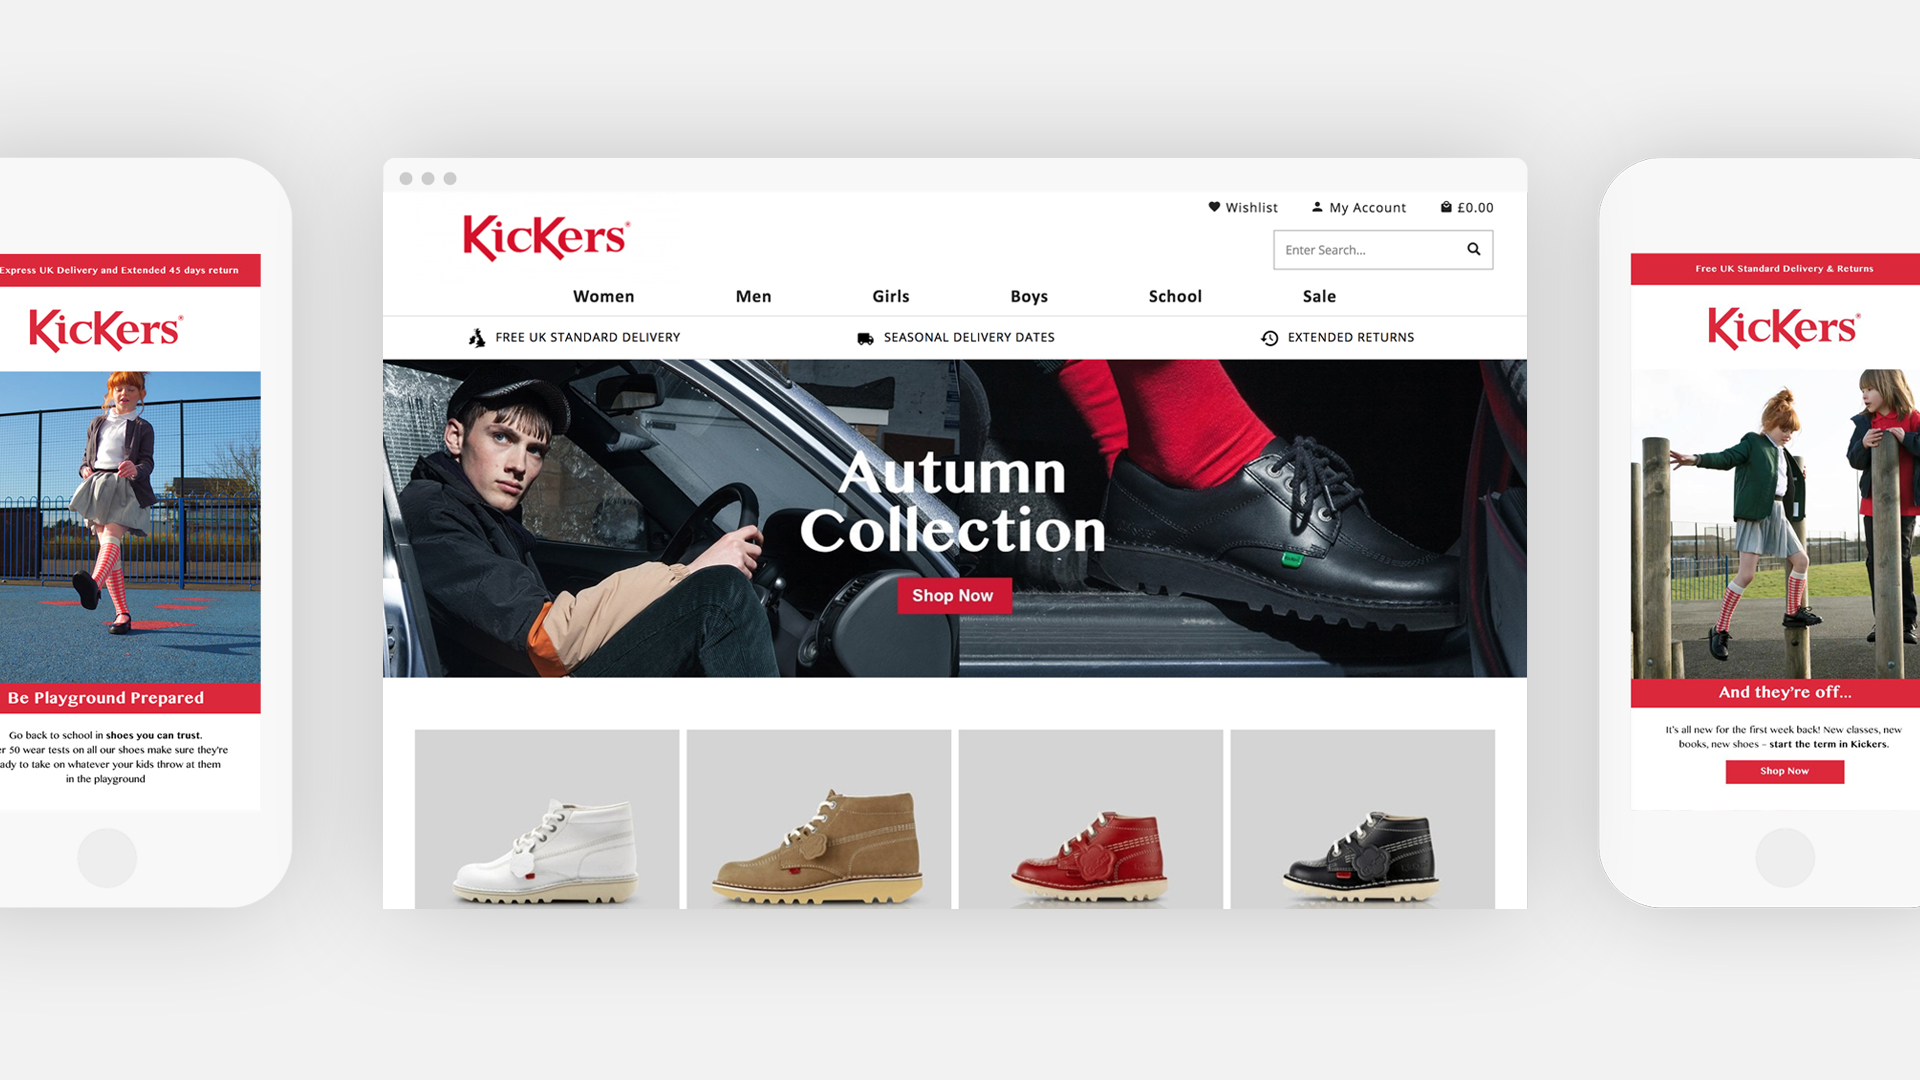 Kickers_Email_Presentation_1.jpg